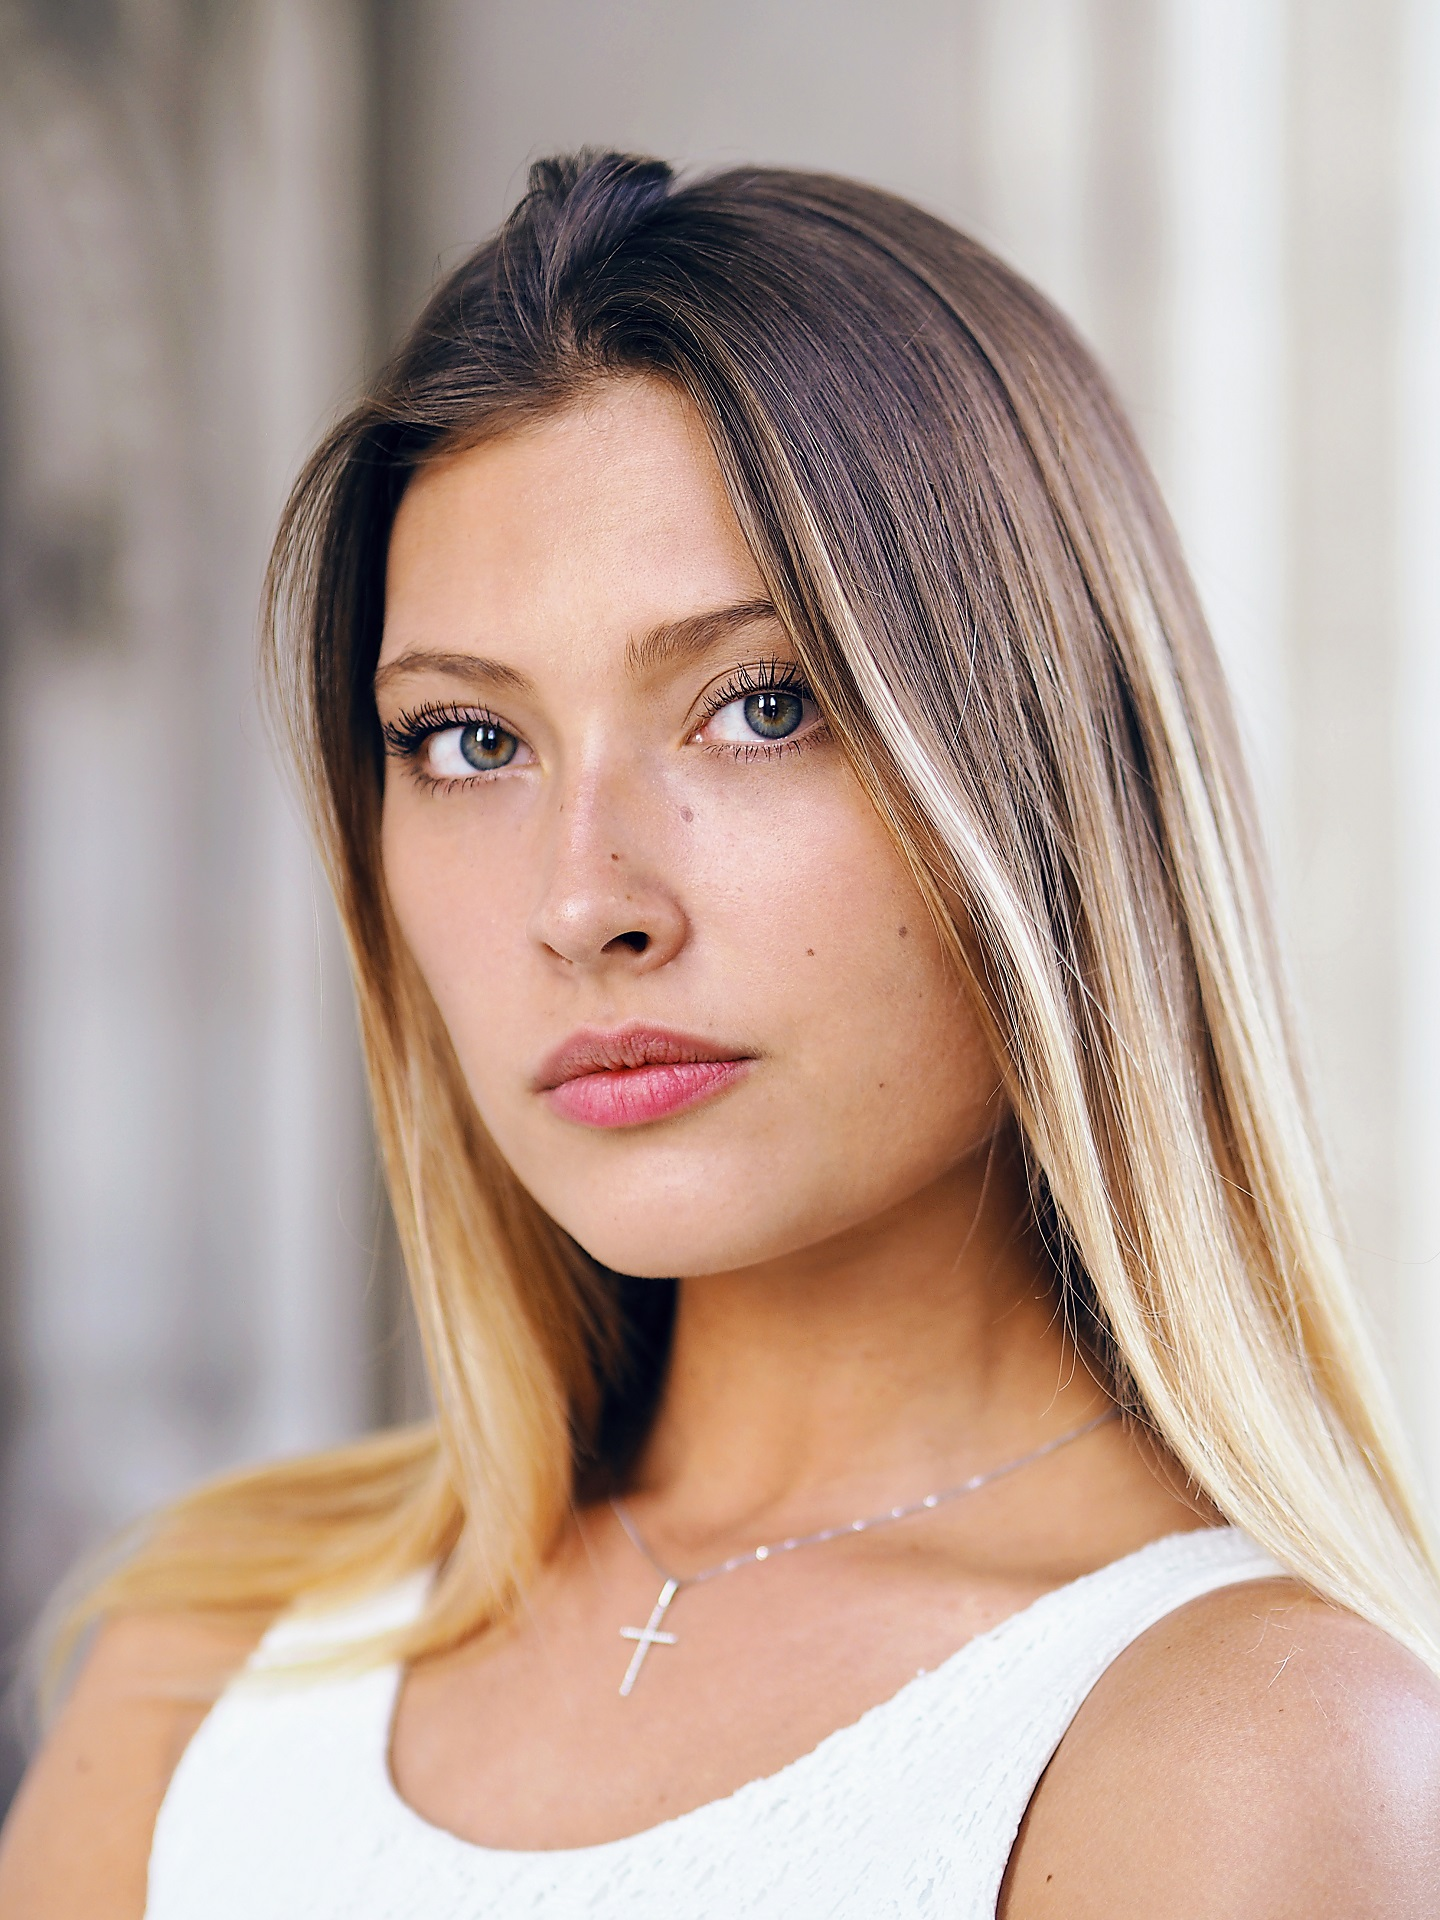 virag-portrait-photographer-vienna-austria-taylor-content.jpg